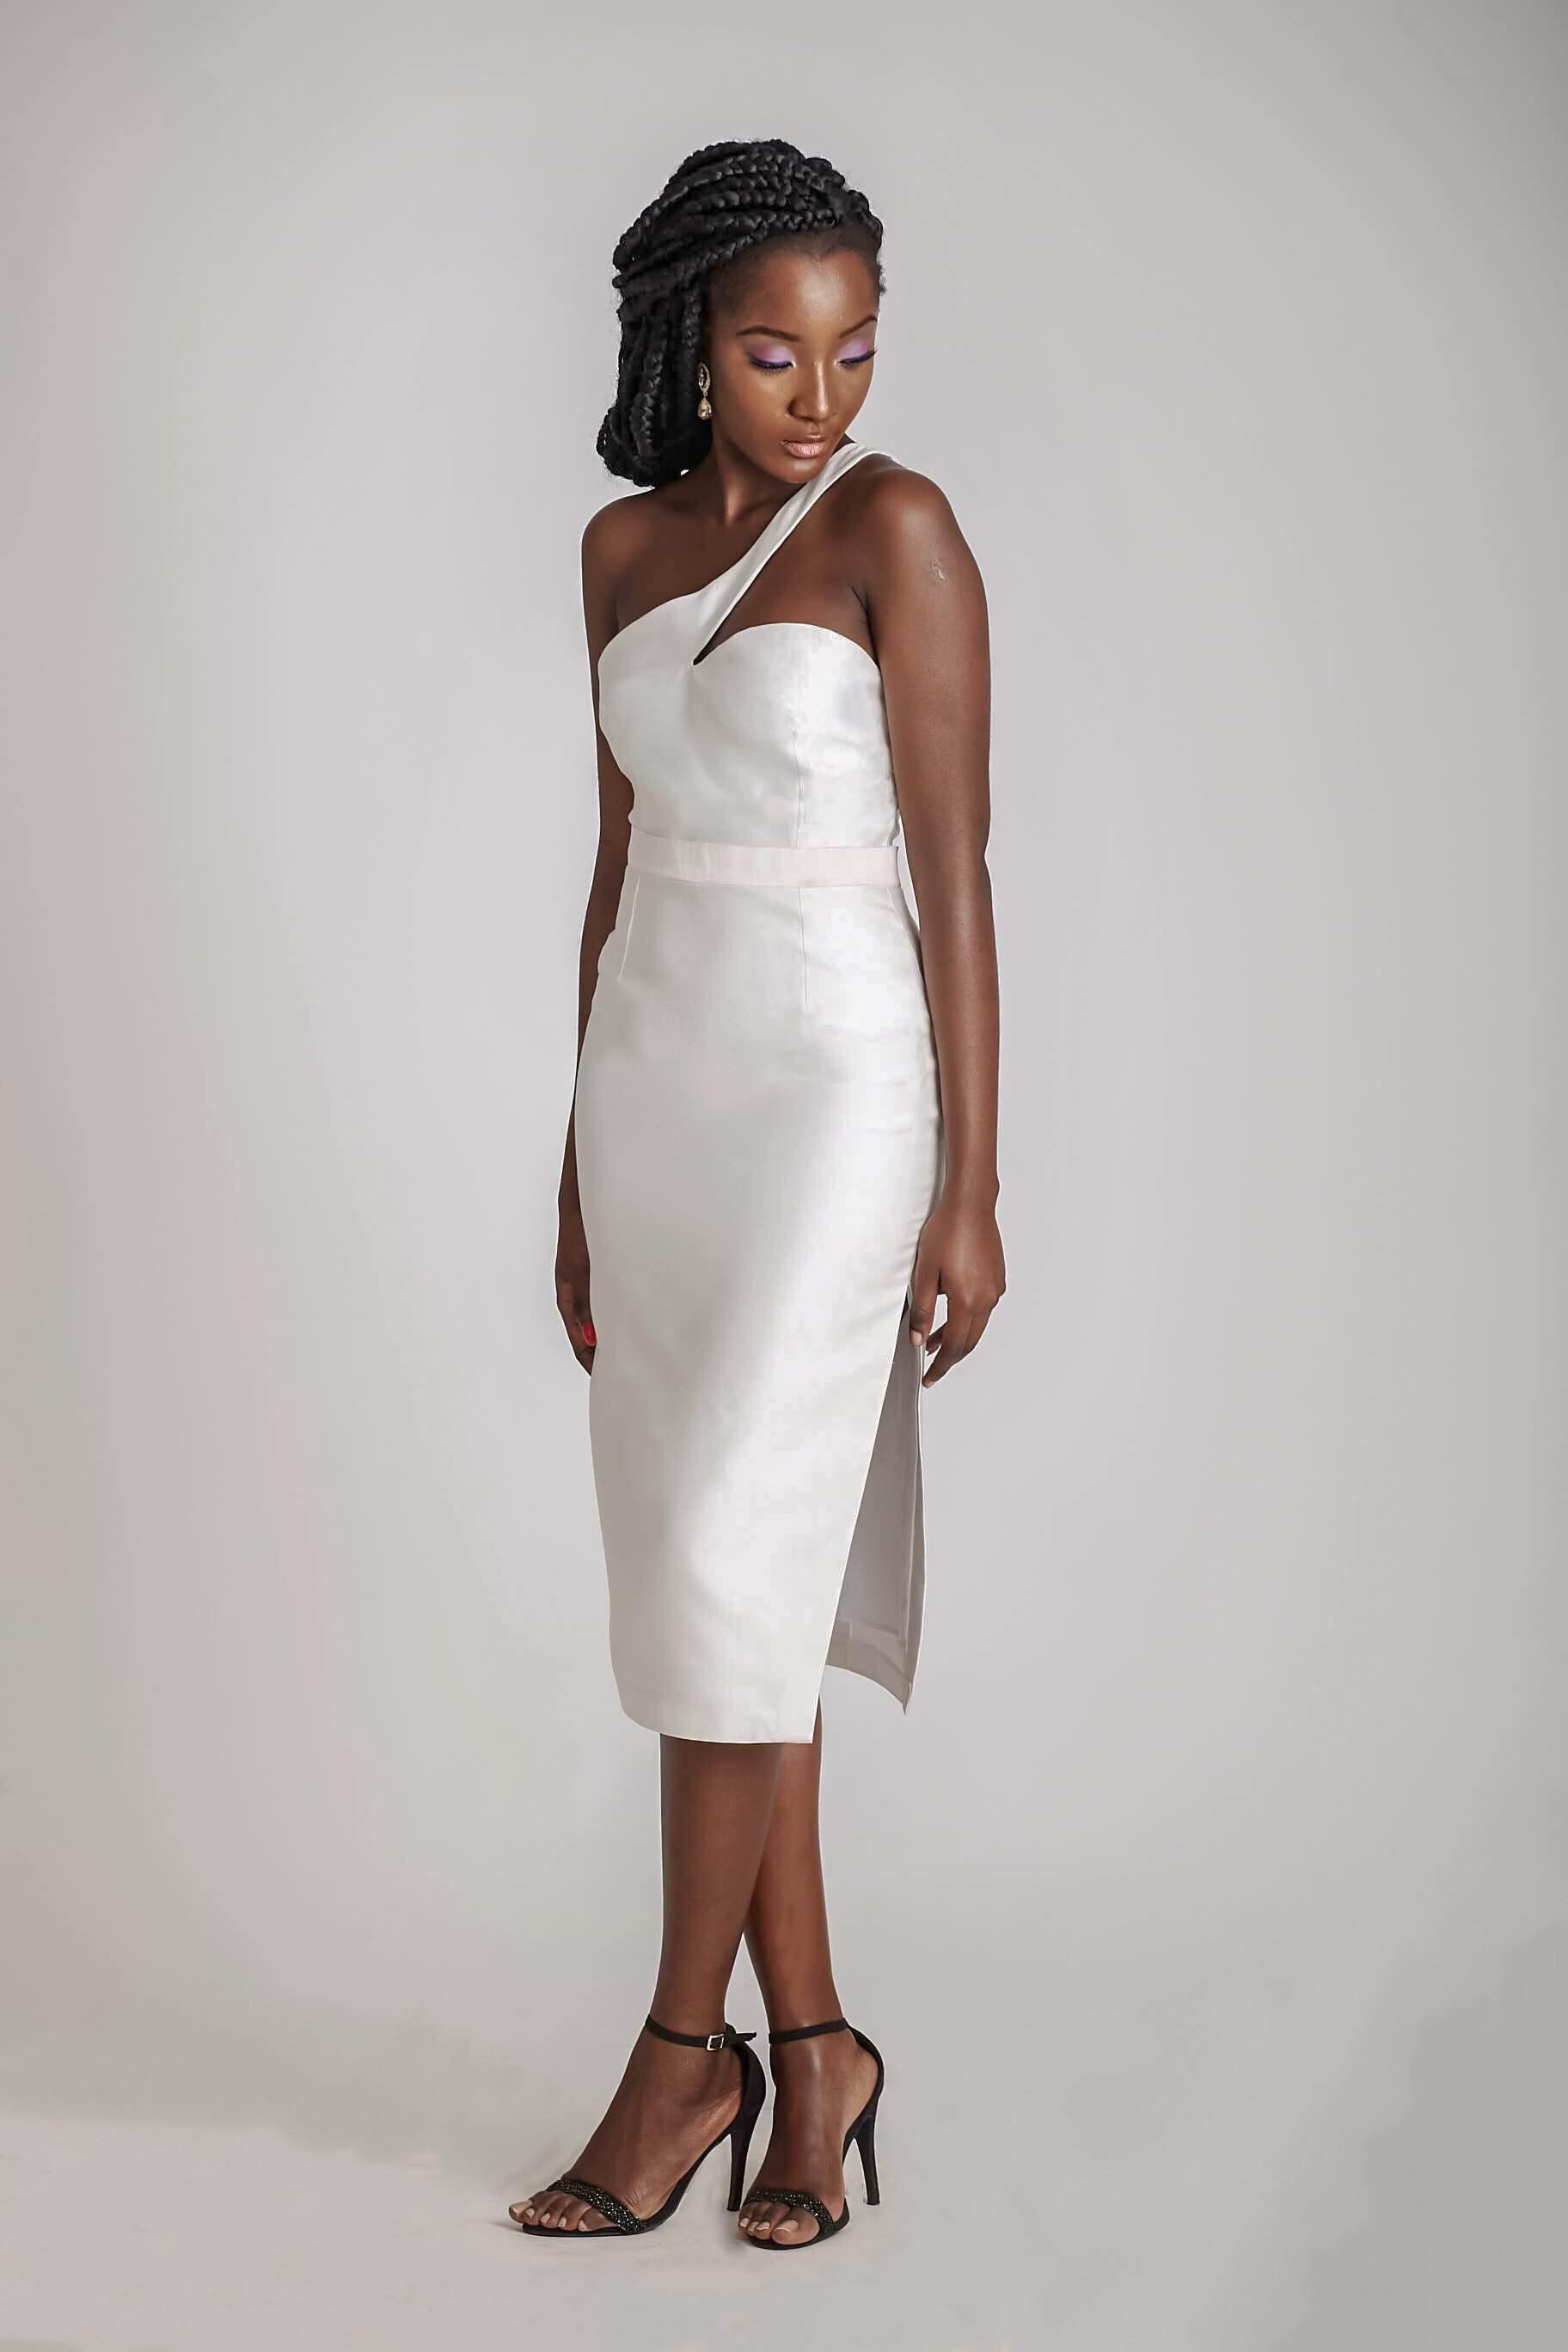 Imad Eduso - BN Style - Collection Lookbook - BellaNaija.com 015